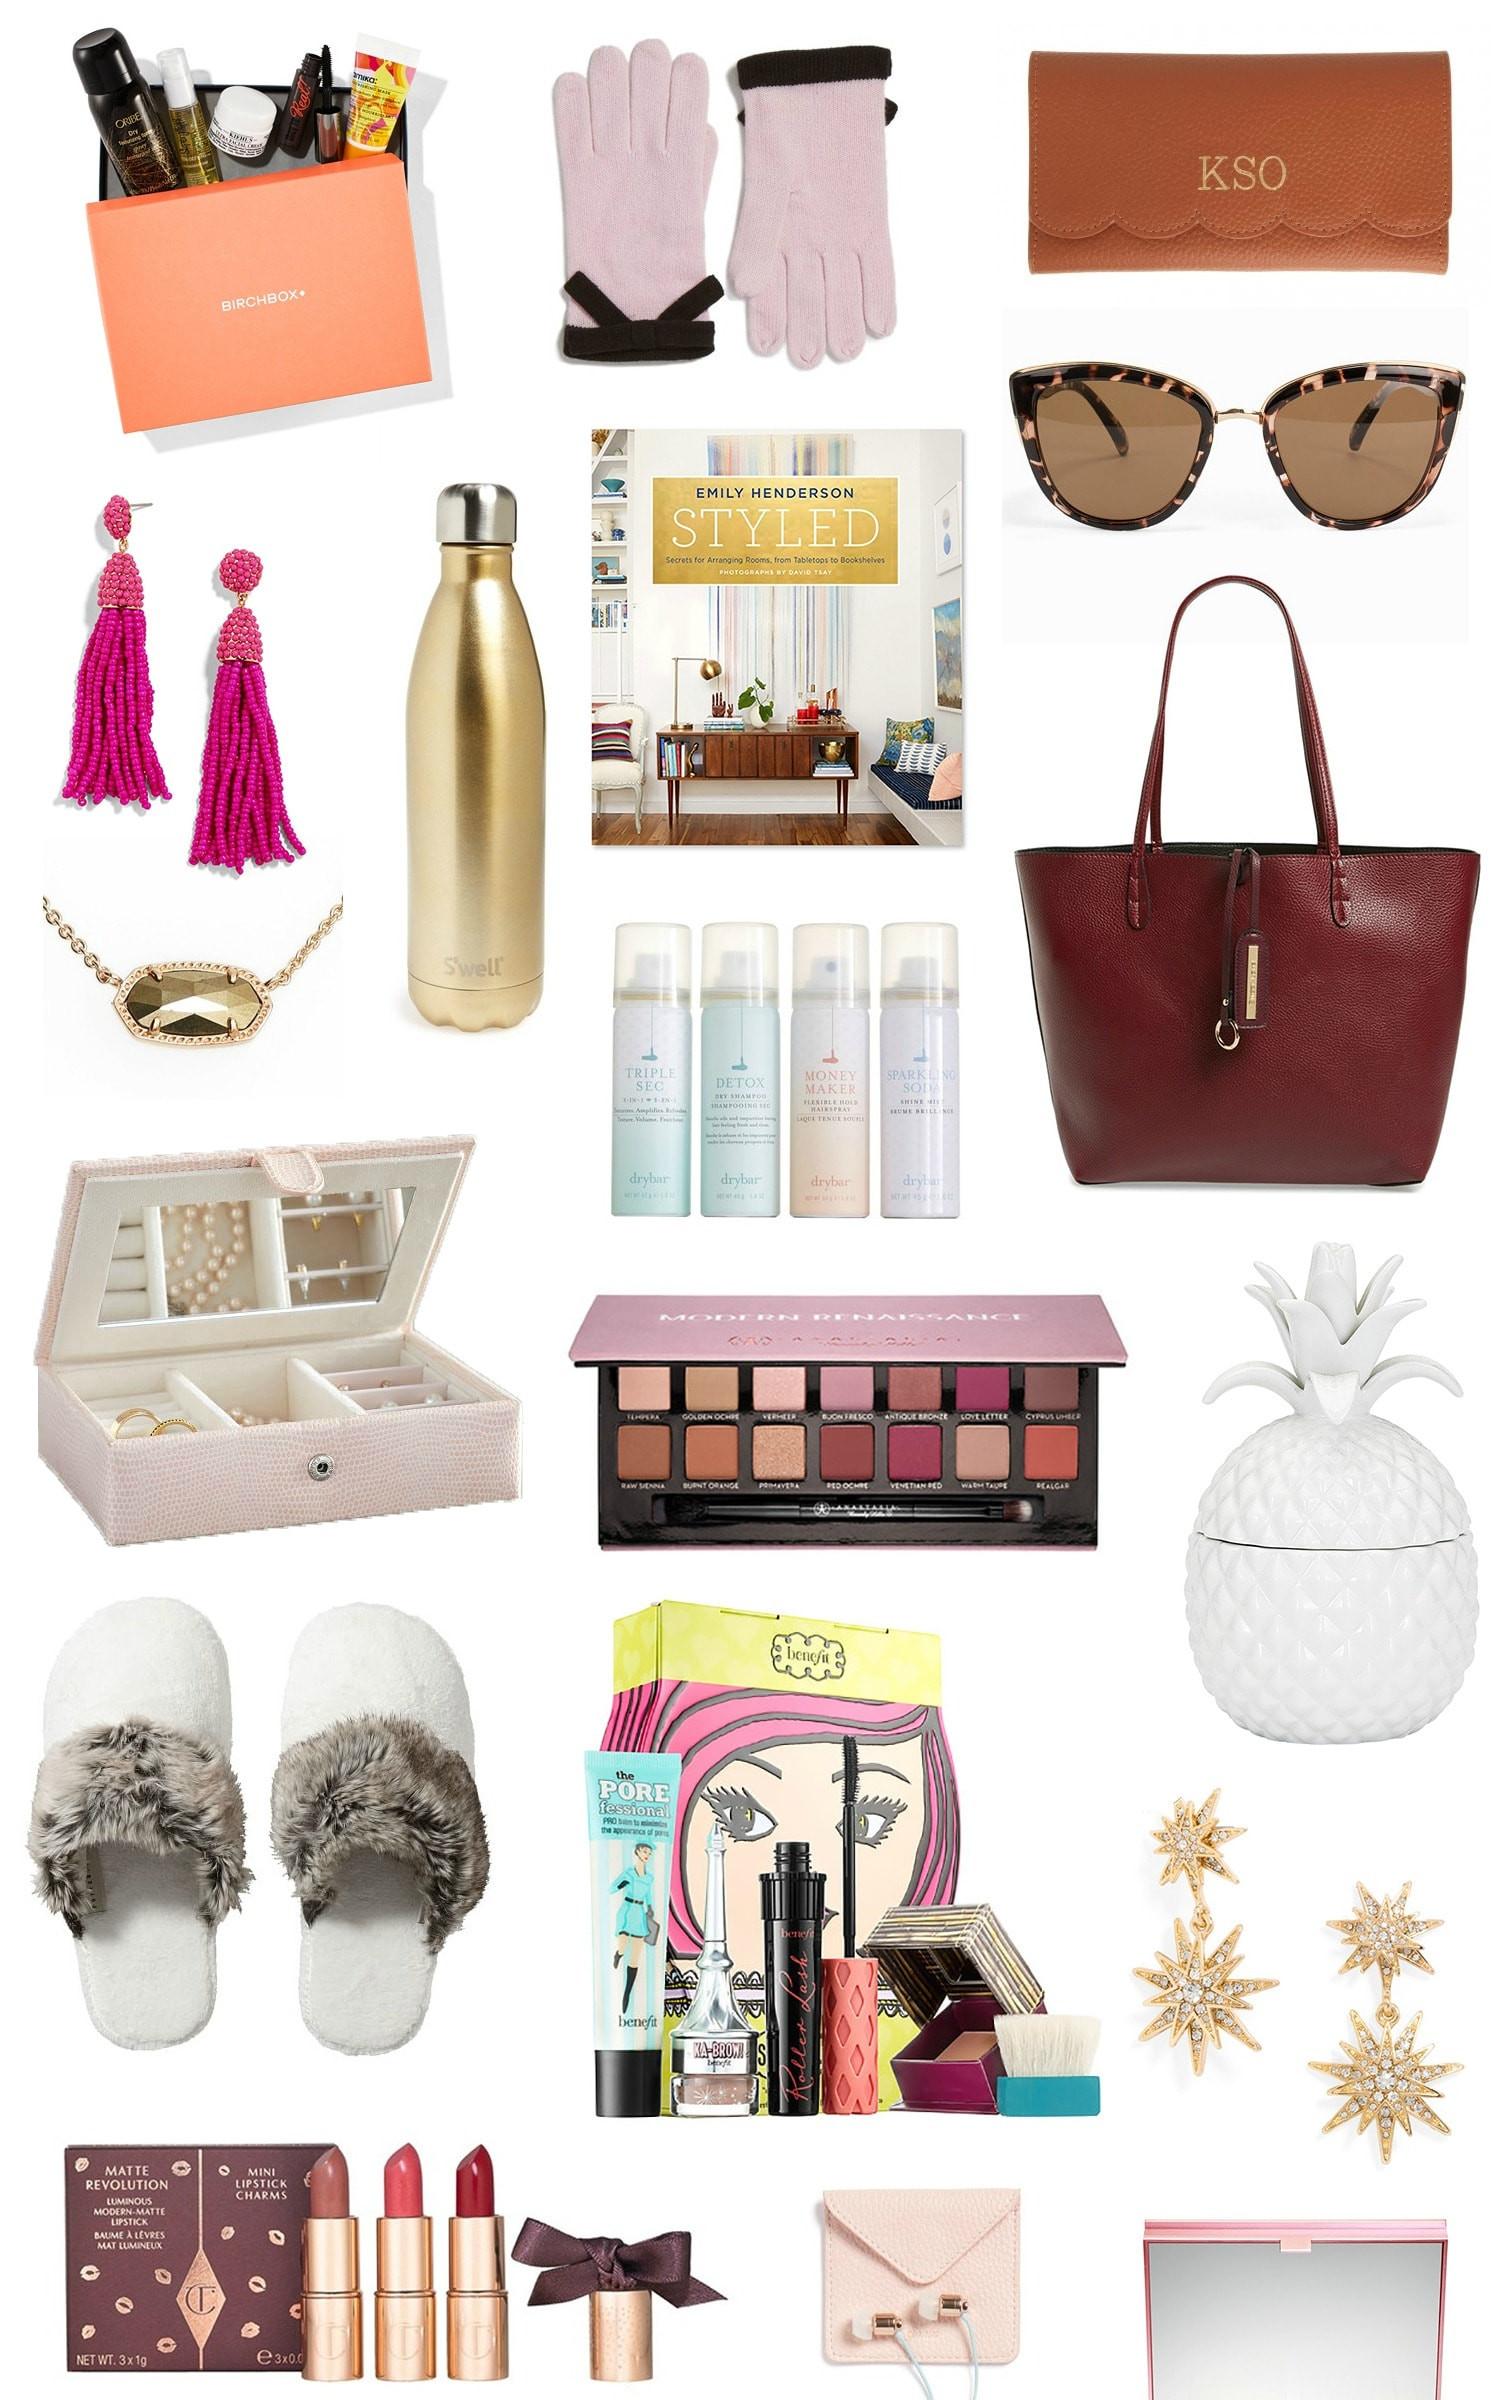 Best Christmas Gift Ideas  The Best Christmas Gift Ideas for Women under $50